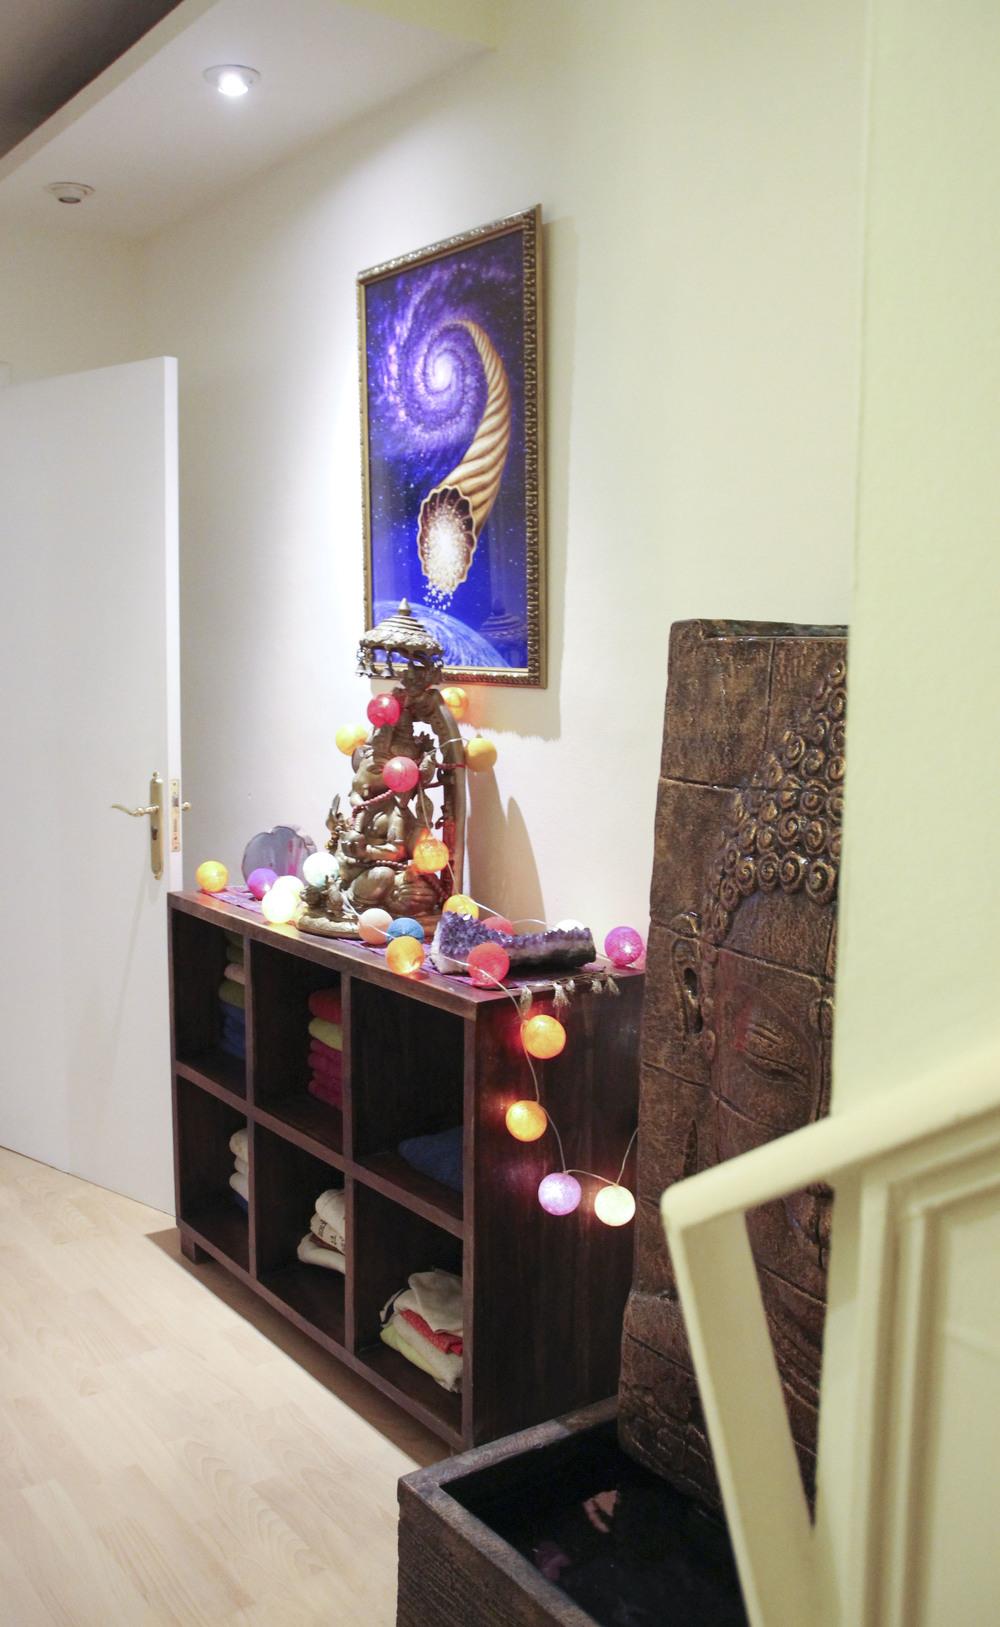 shuniayoga kundalini  yoga studio barcelona2069.jpg